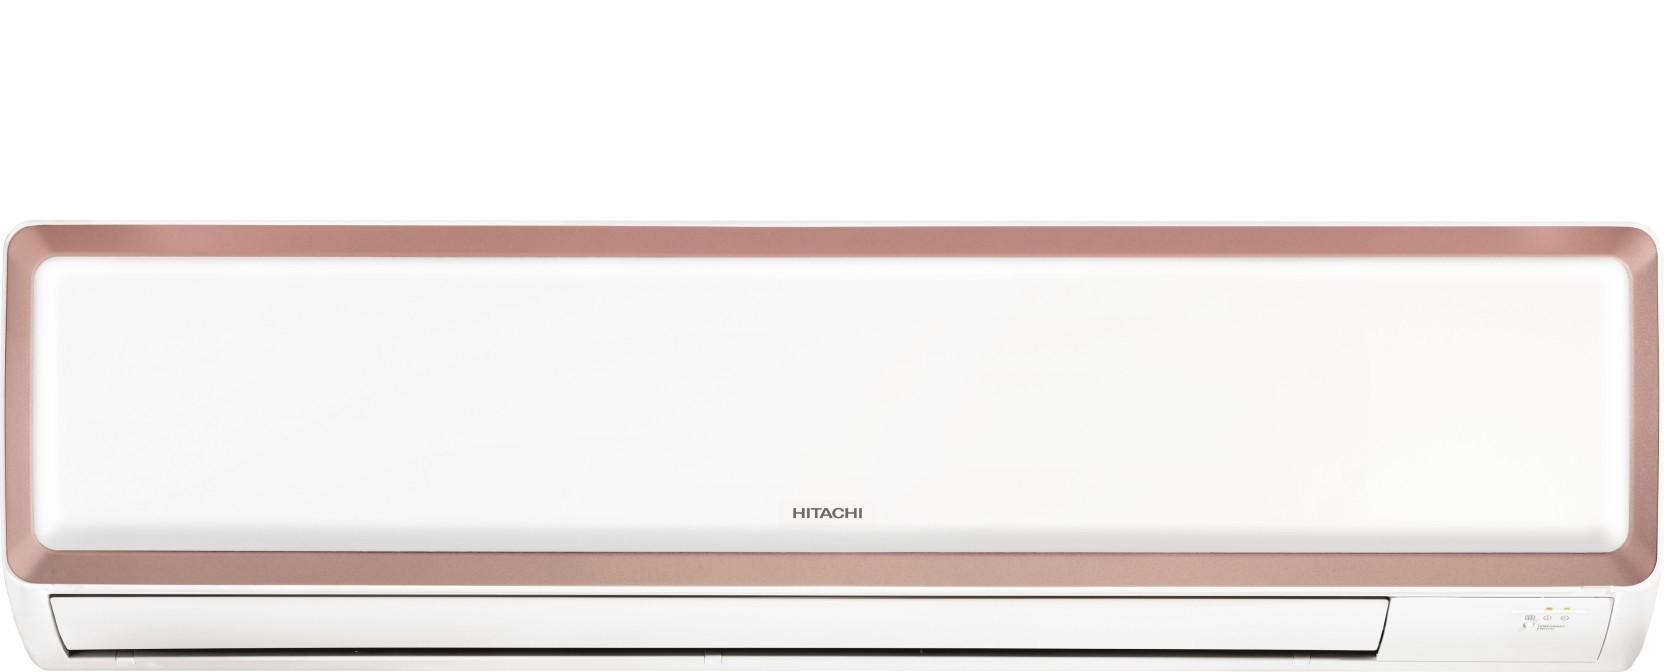 Hitachi 1 Ton 3 Star BEE Rating 2017 Split AC - Copper